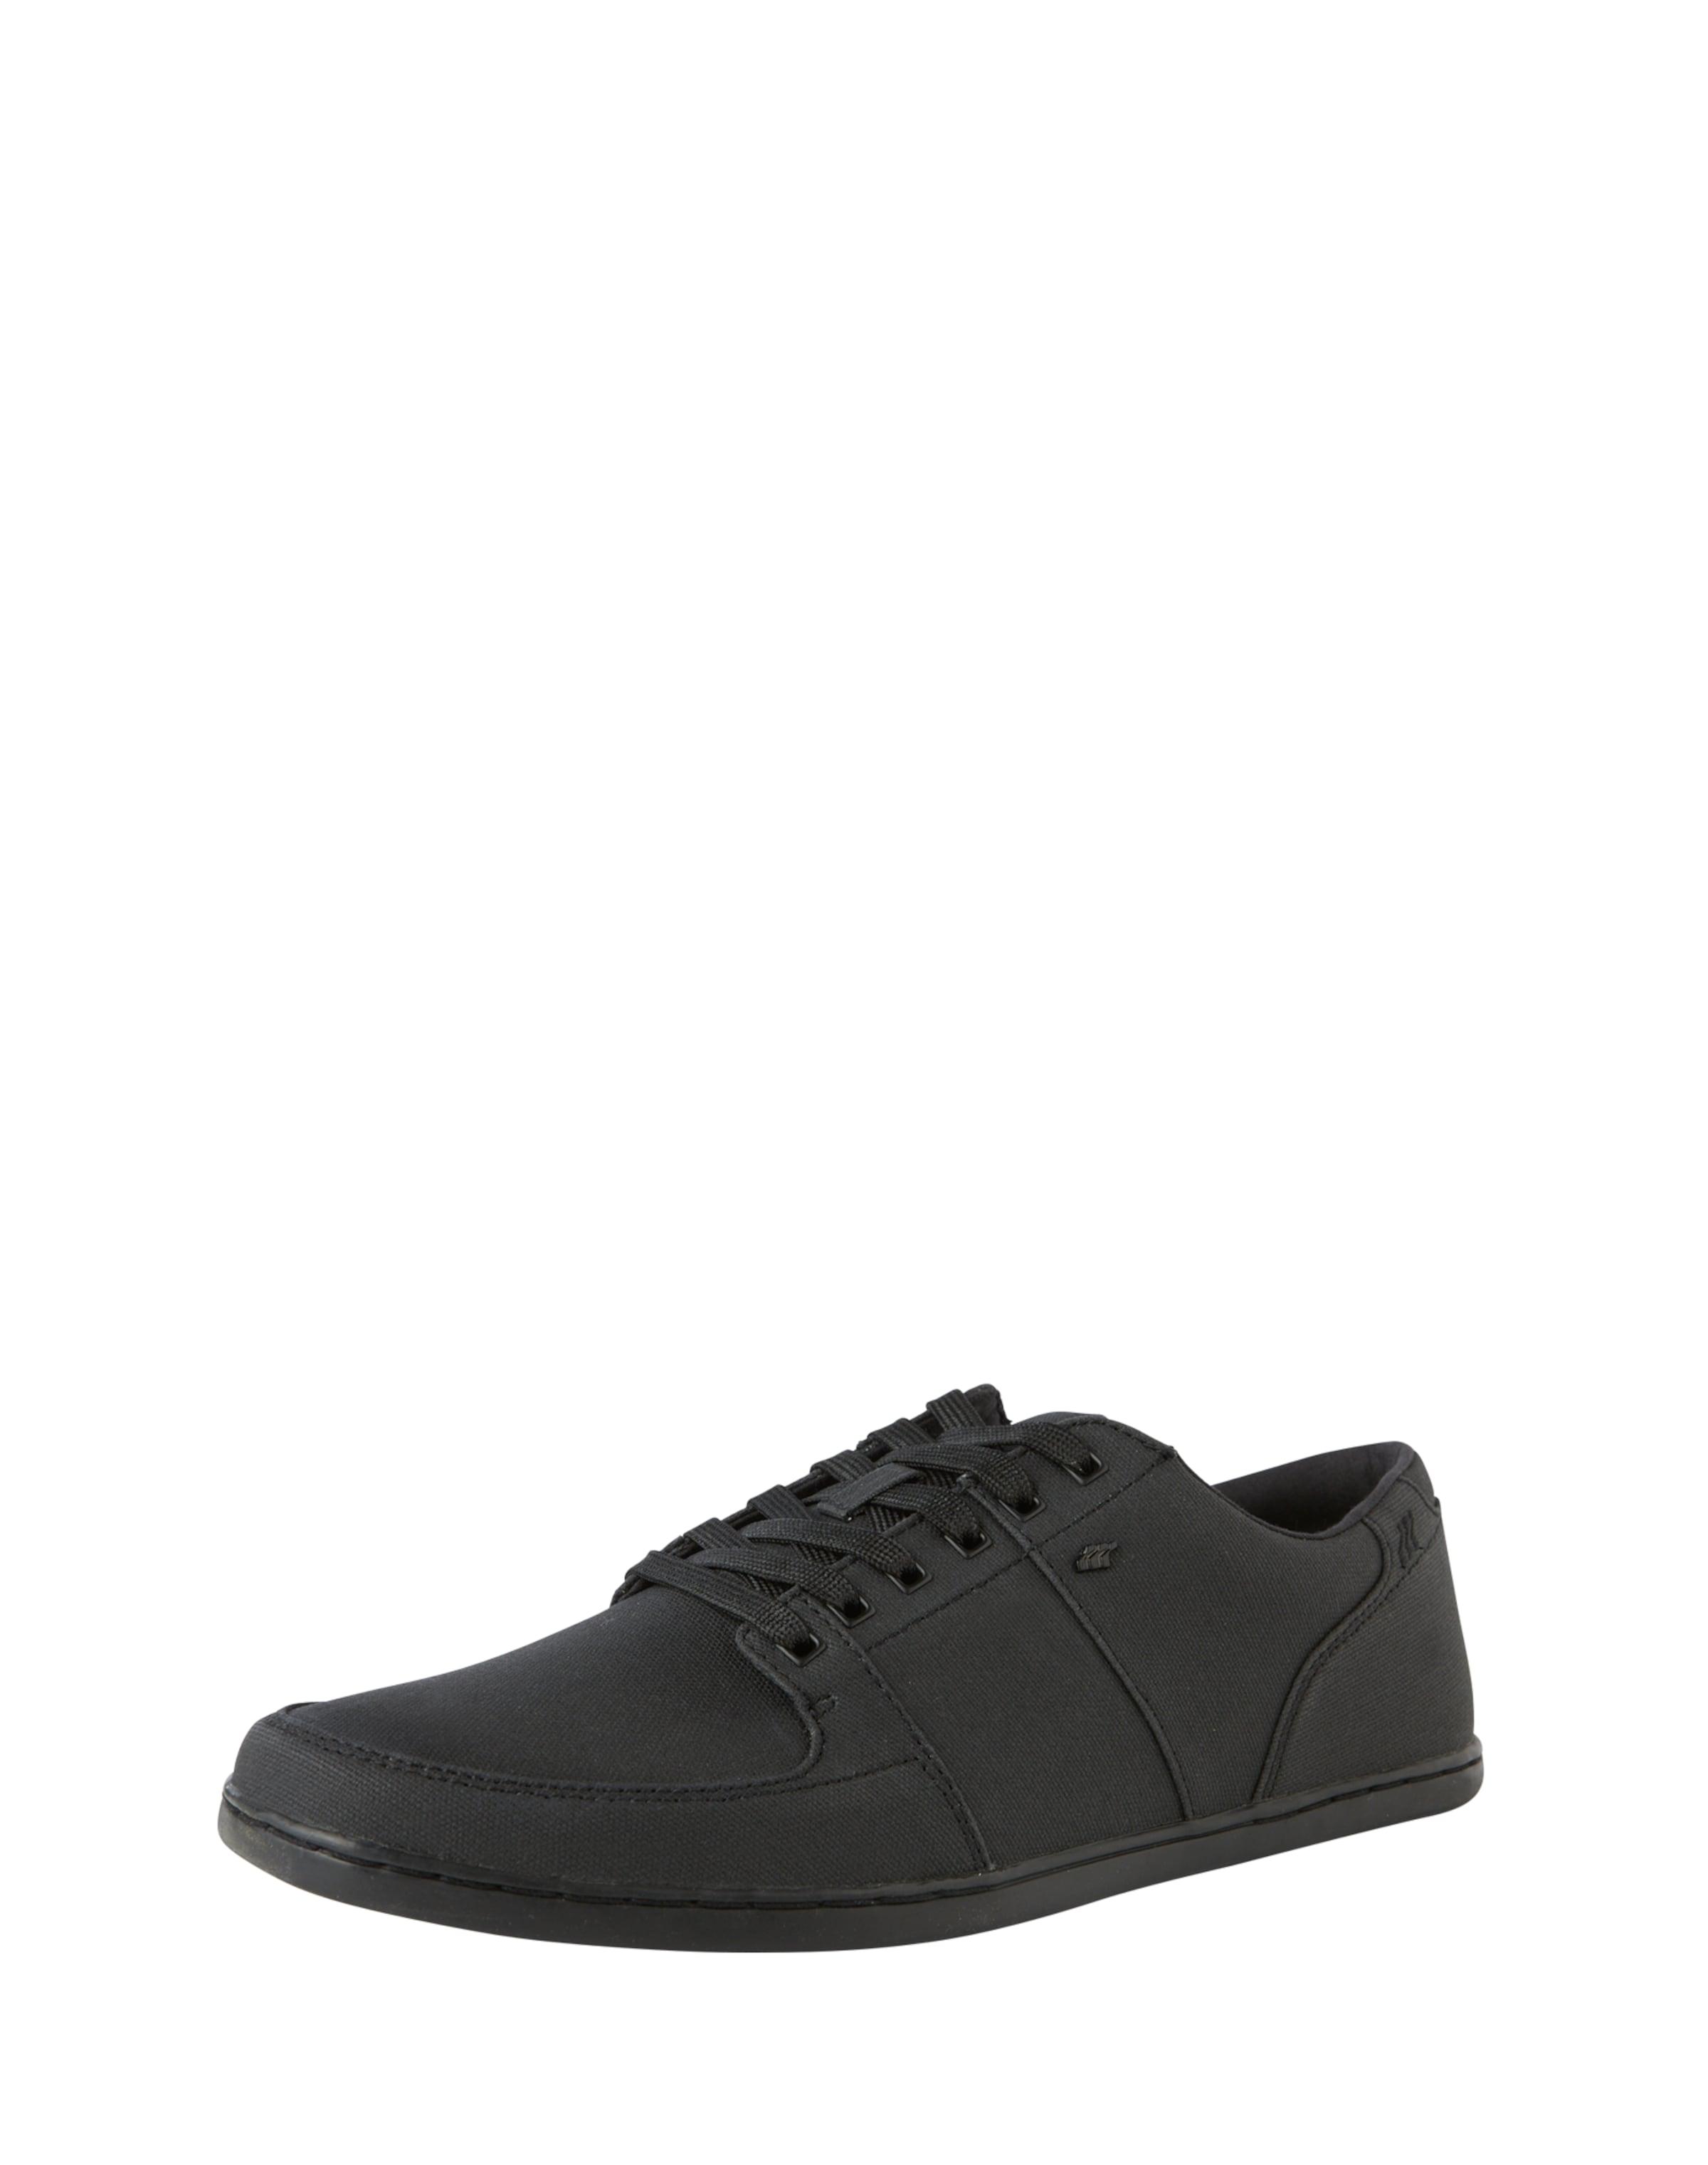 'spencer Icn Wxd Schwarz Boxfresh Sneaker In Cnvs' WD9HE2eYI